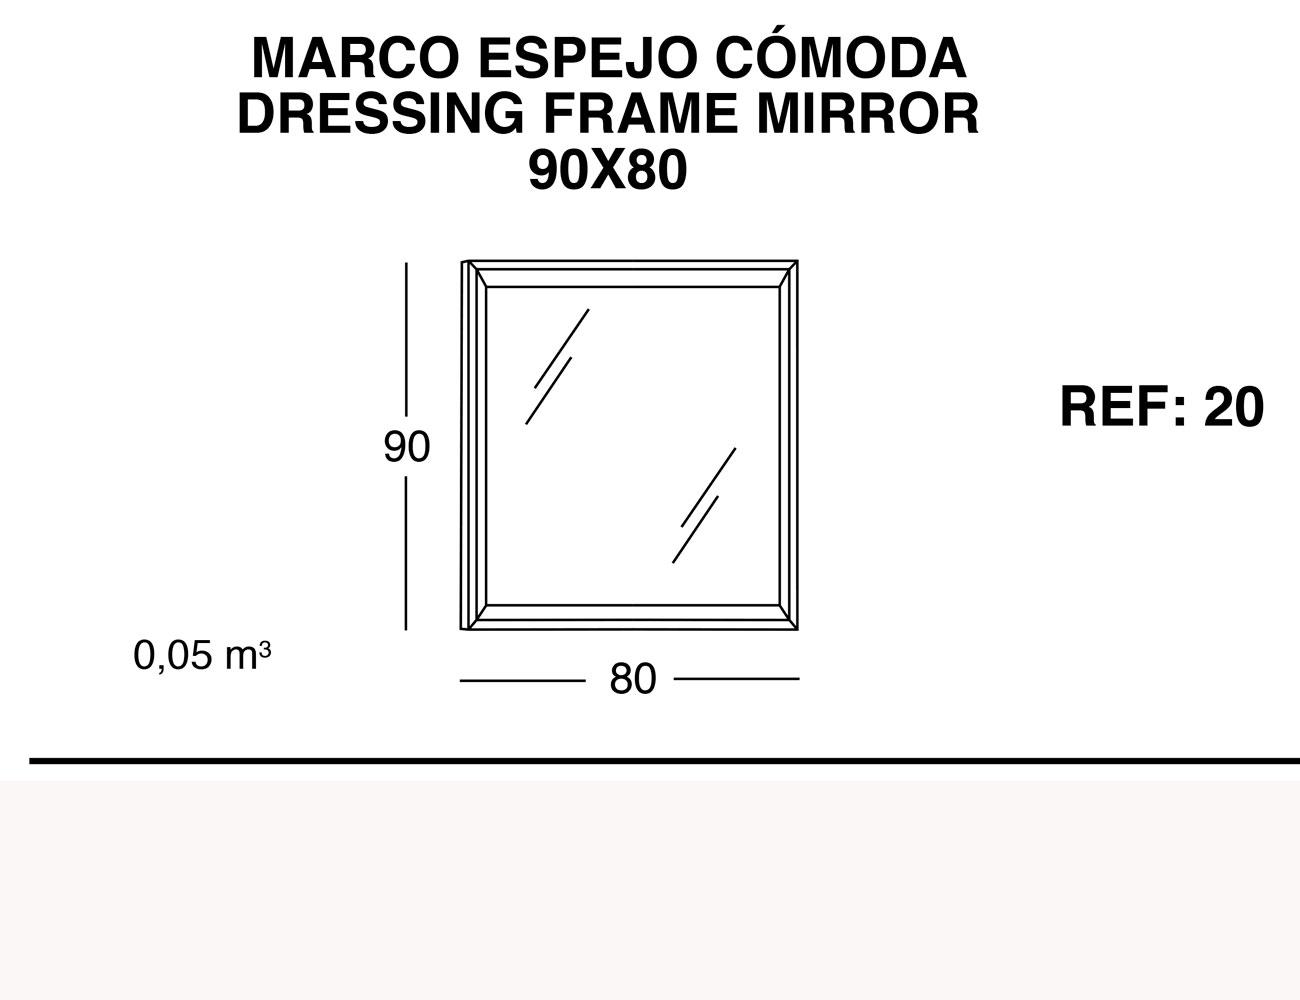 Marco espejo comoda 90 80